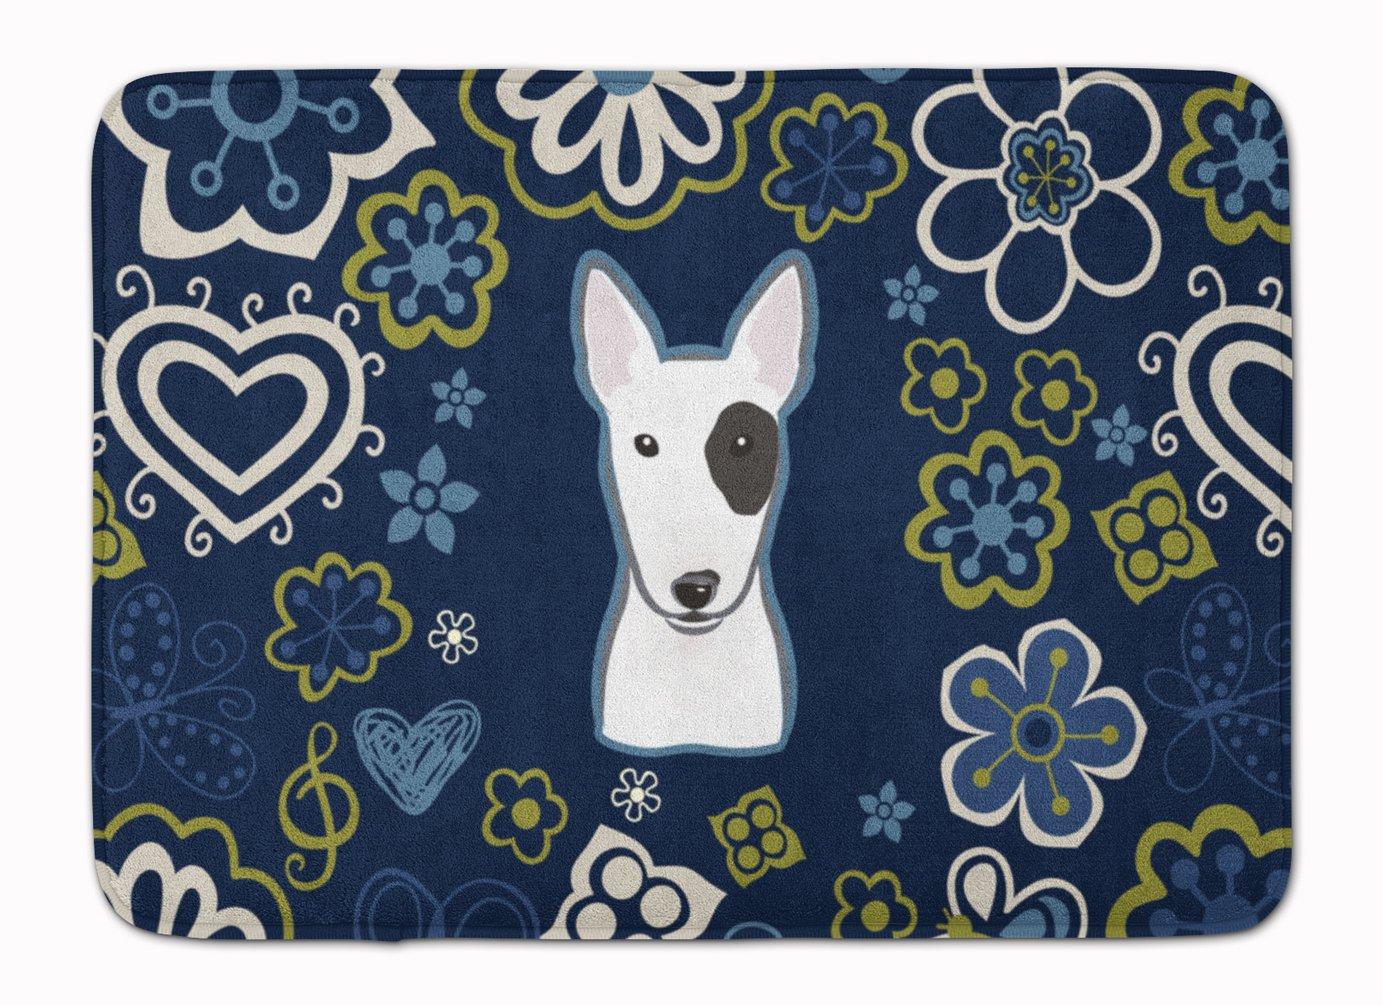 Caroline's Treasures Blue Flowers Bull Terrier Floor Mat 19' x 27' Multicolor